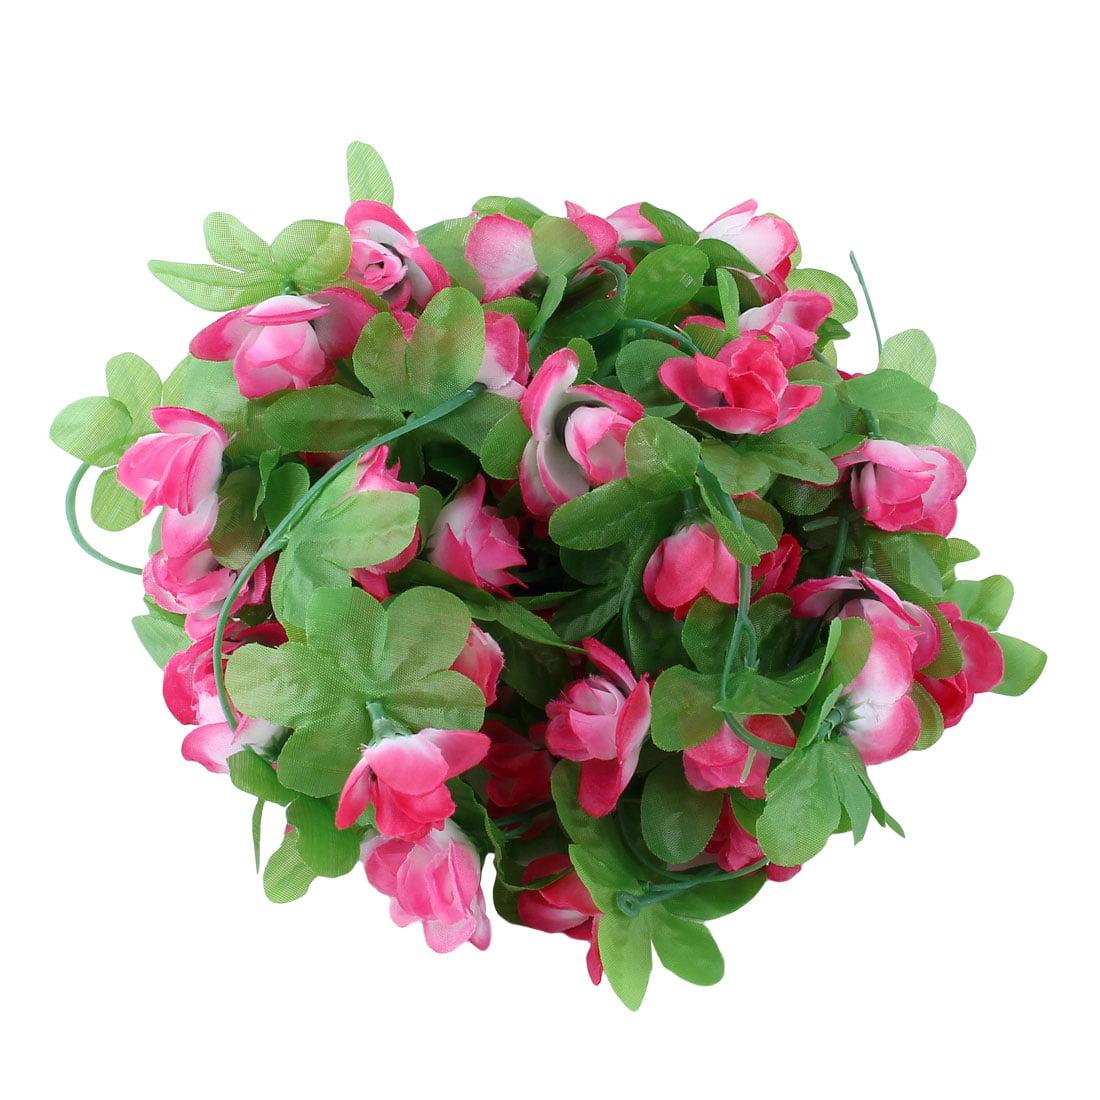 Wedding Plastic Artificial Flower Hanging Ivy Vine Pink White 7.2ft Length 2pcs